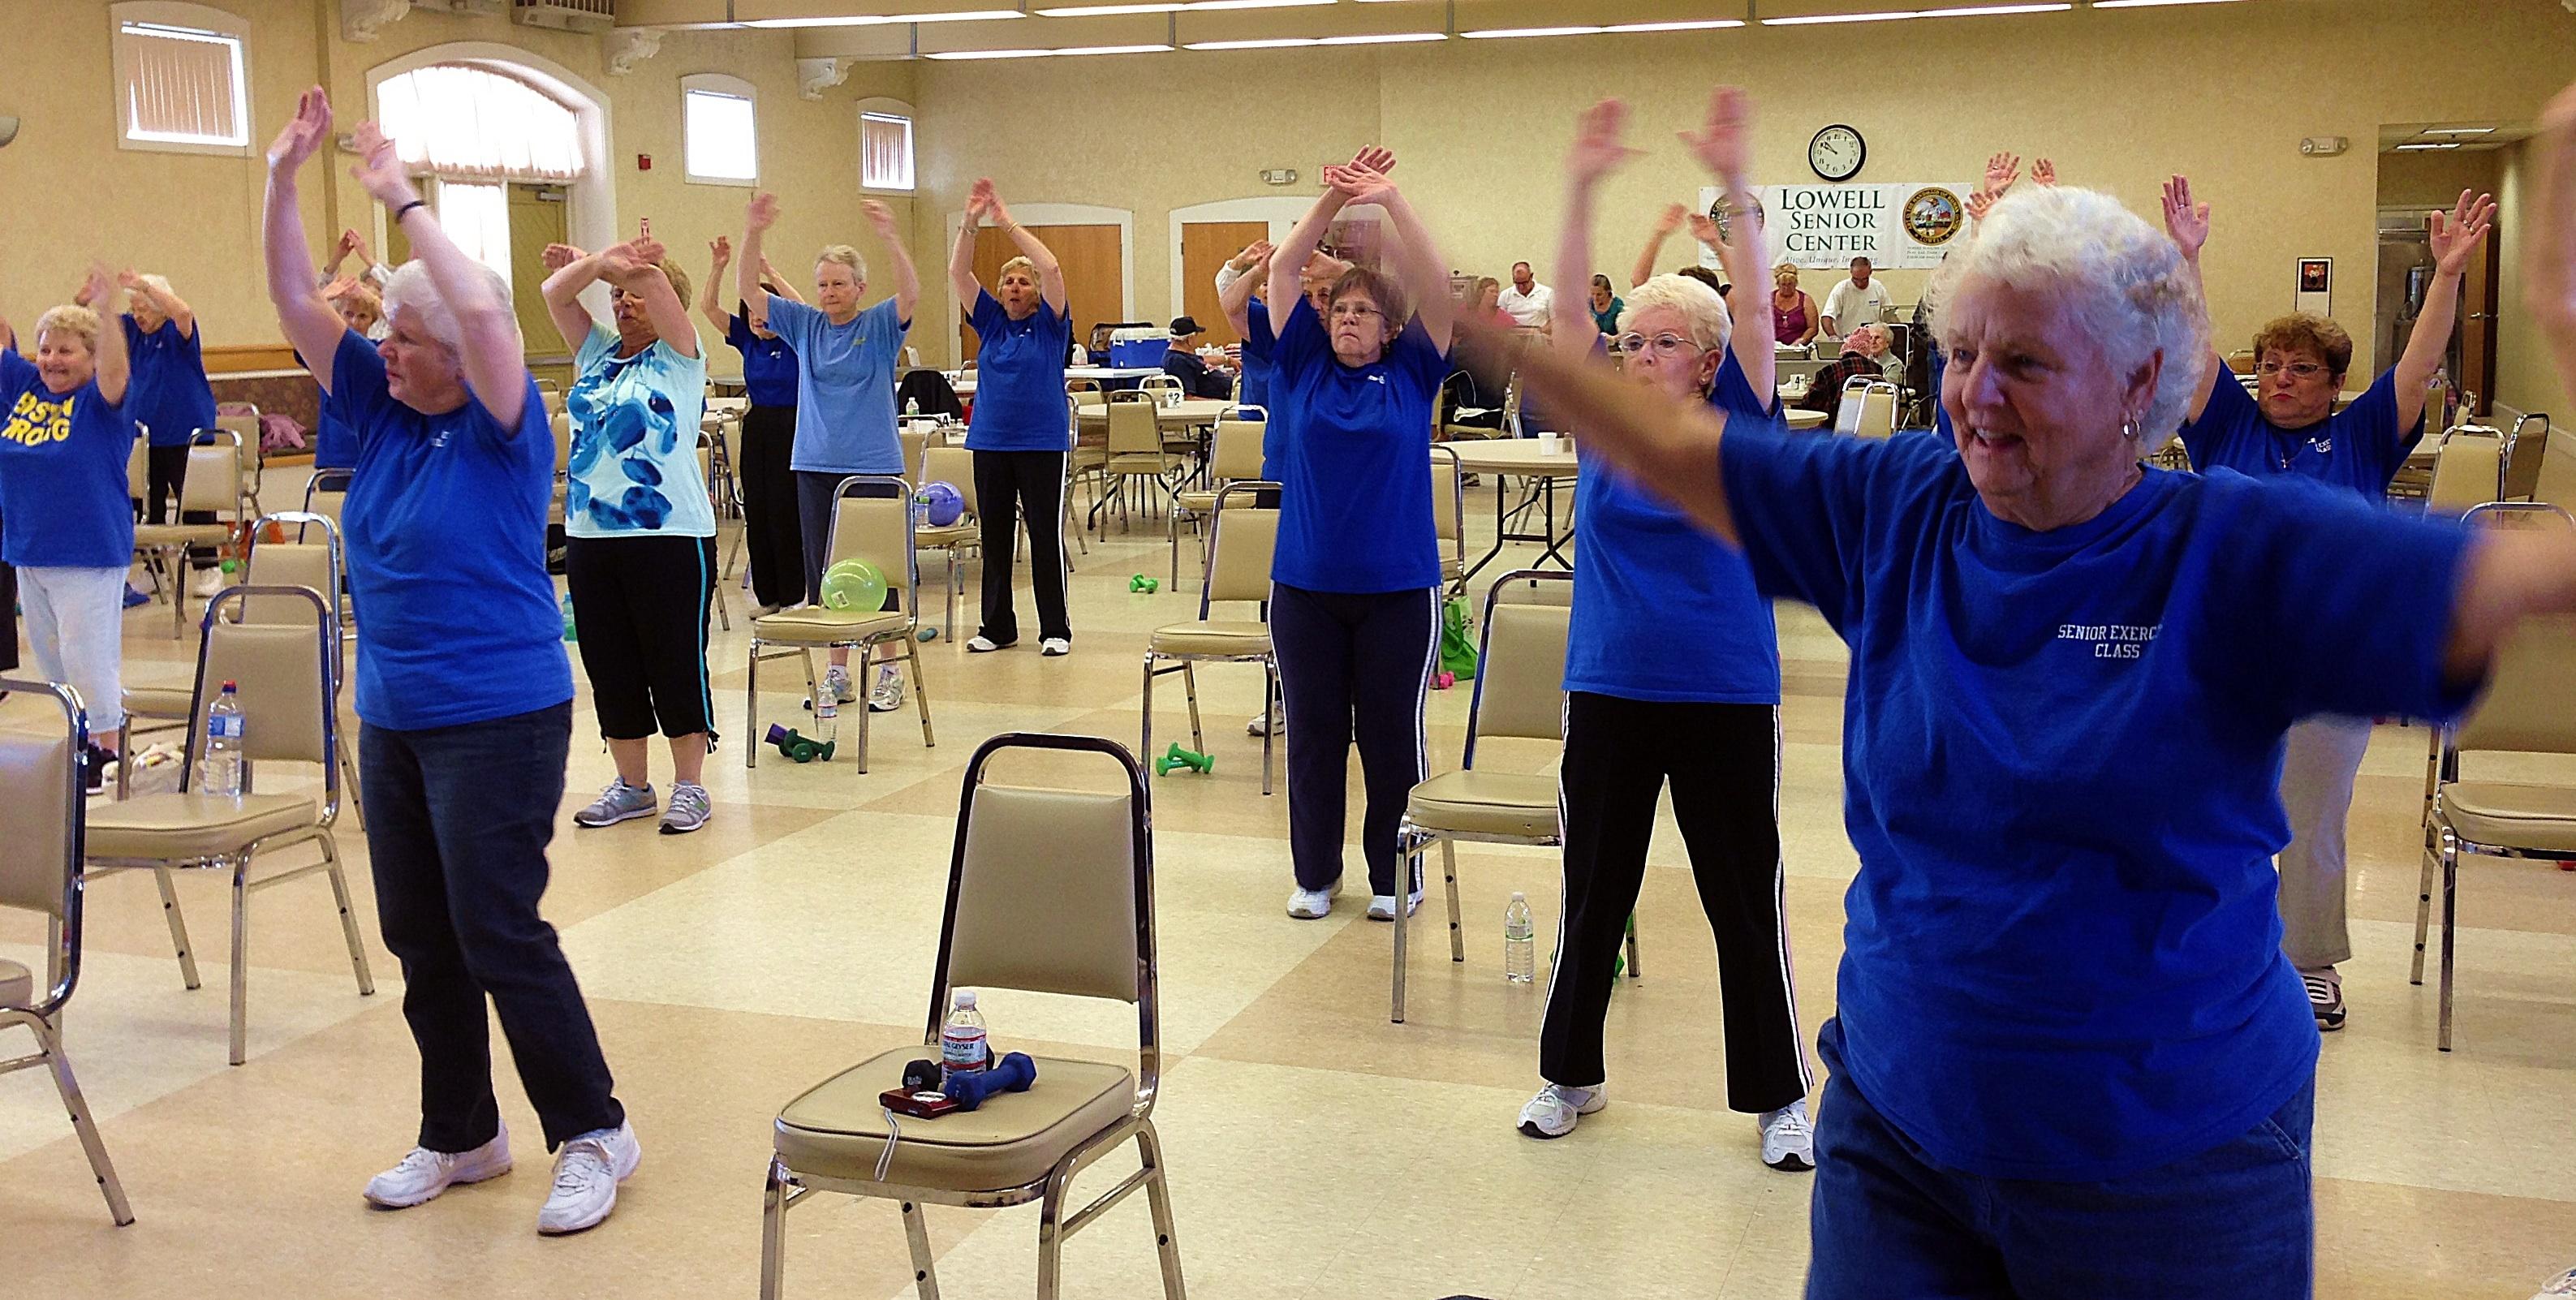 Rita Neal Honored For Keeping Seniors Moving